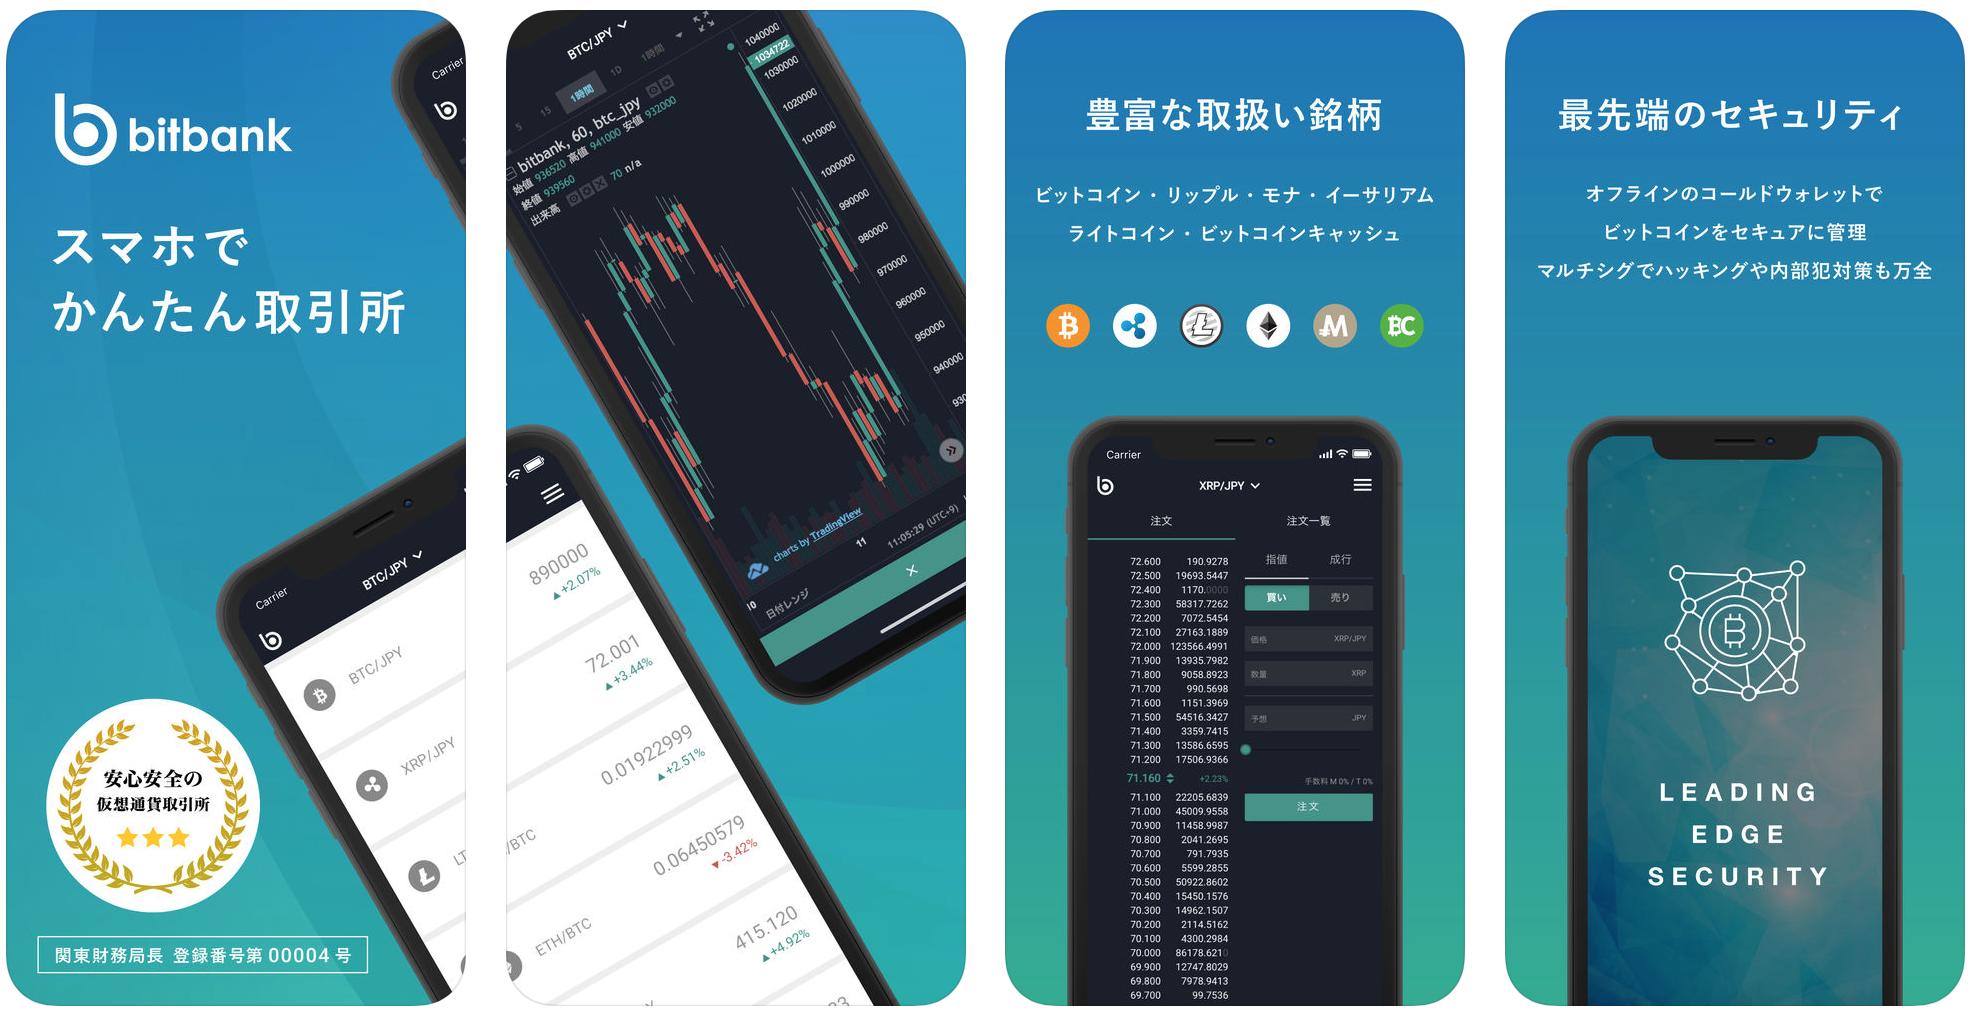 bitbankのアプリ画面